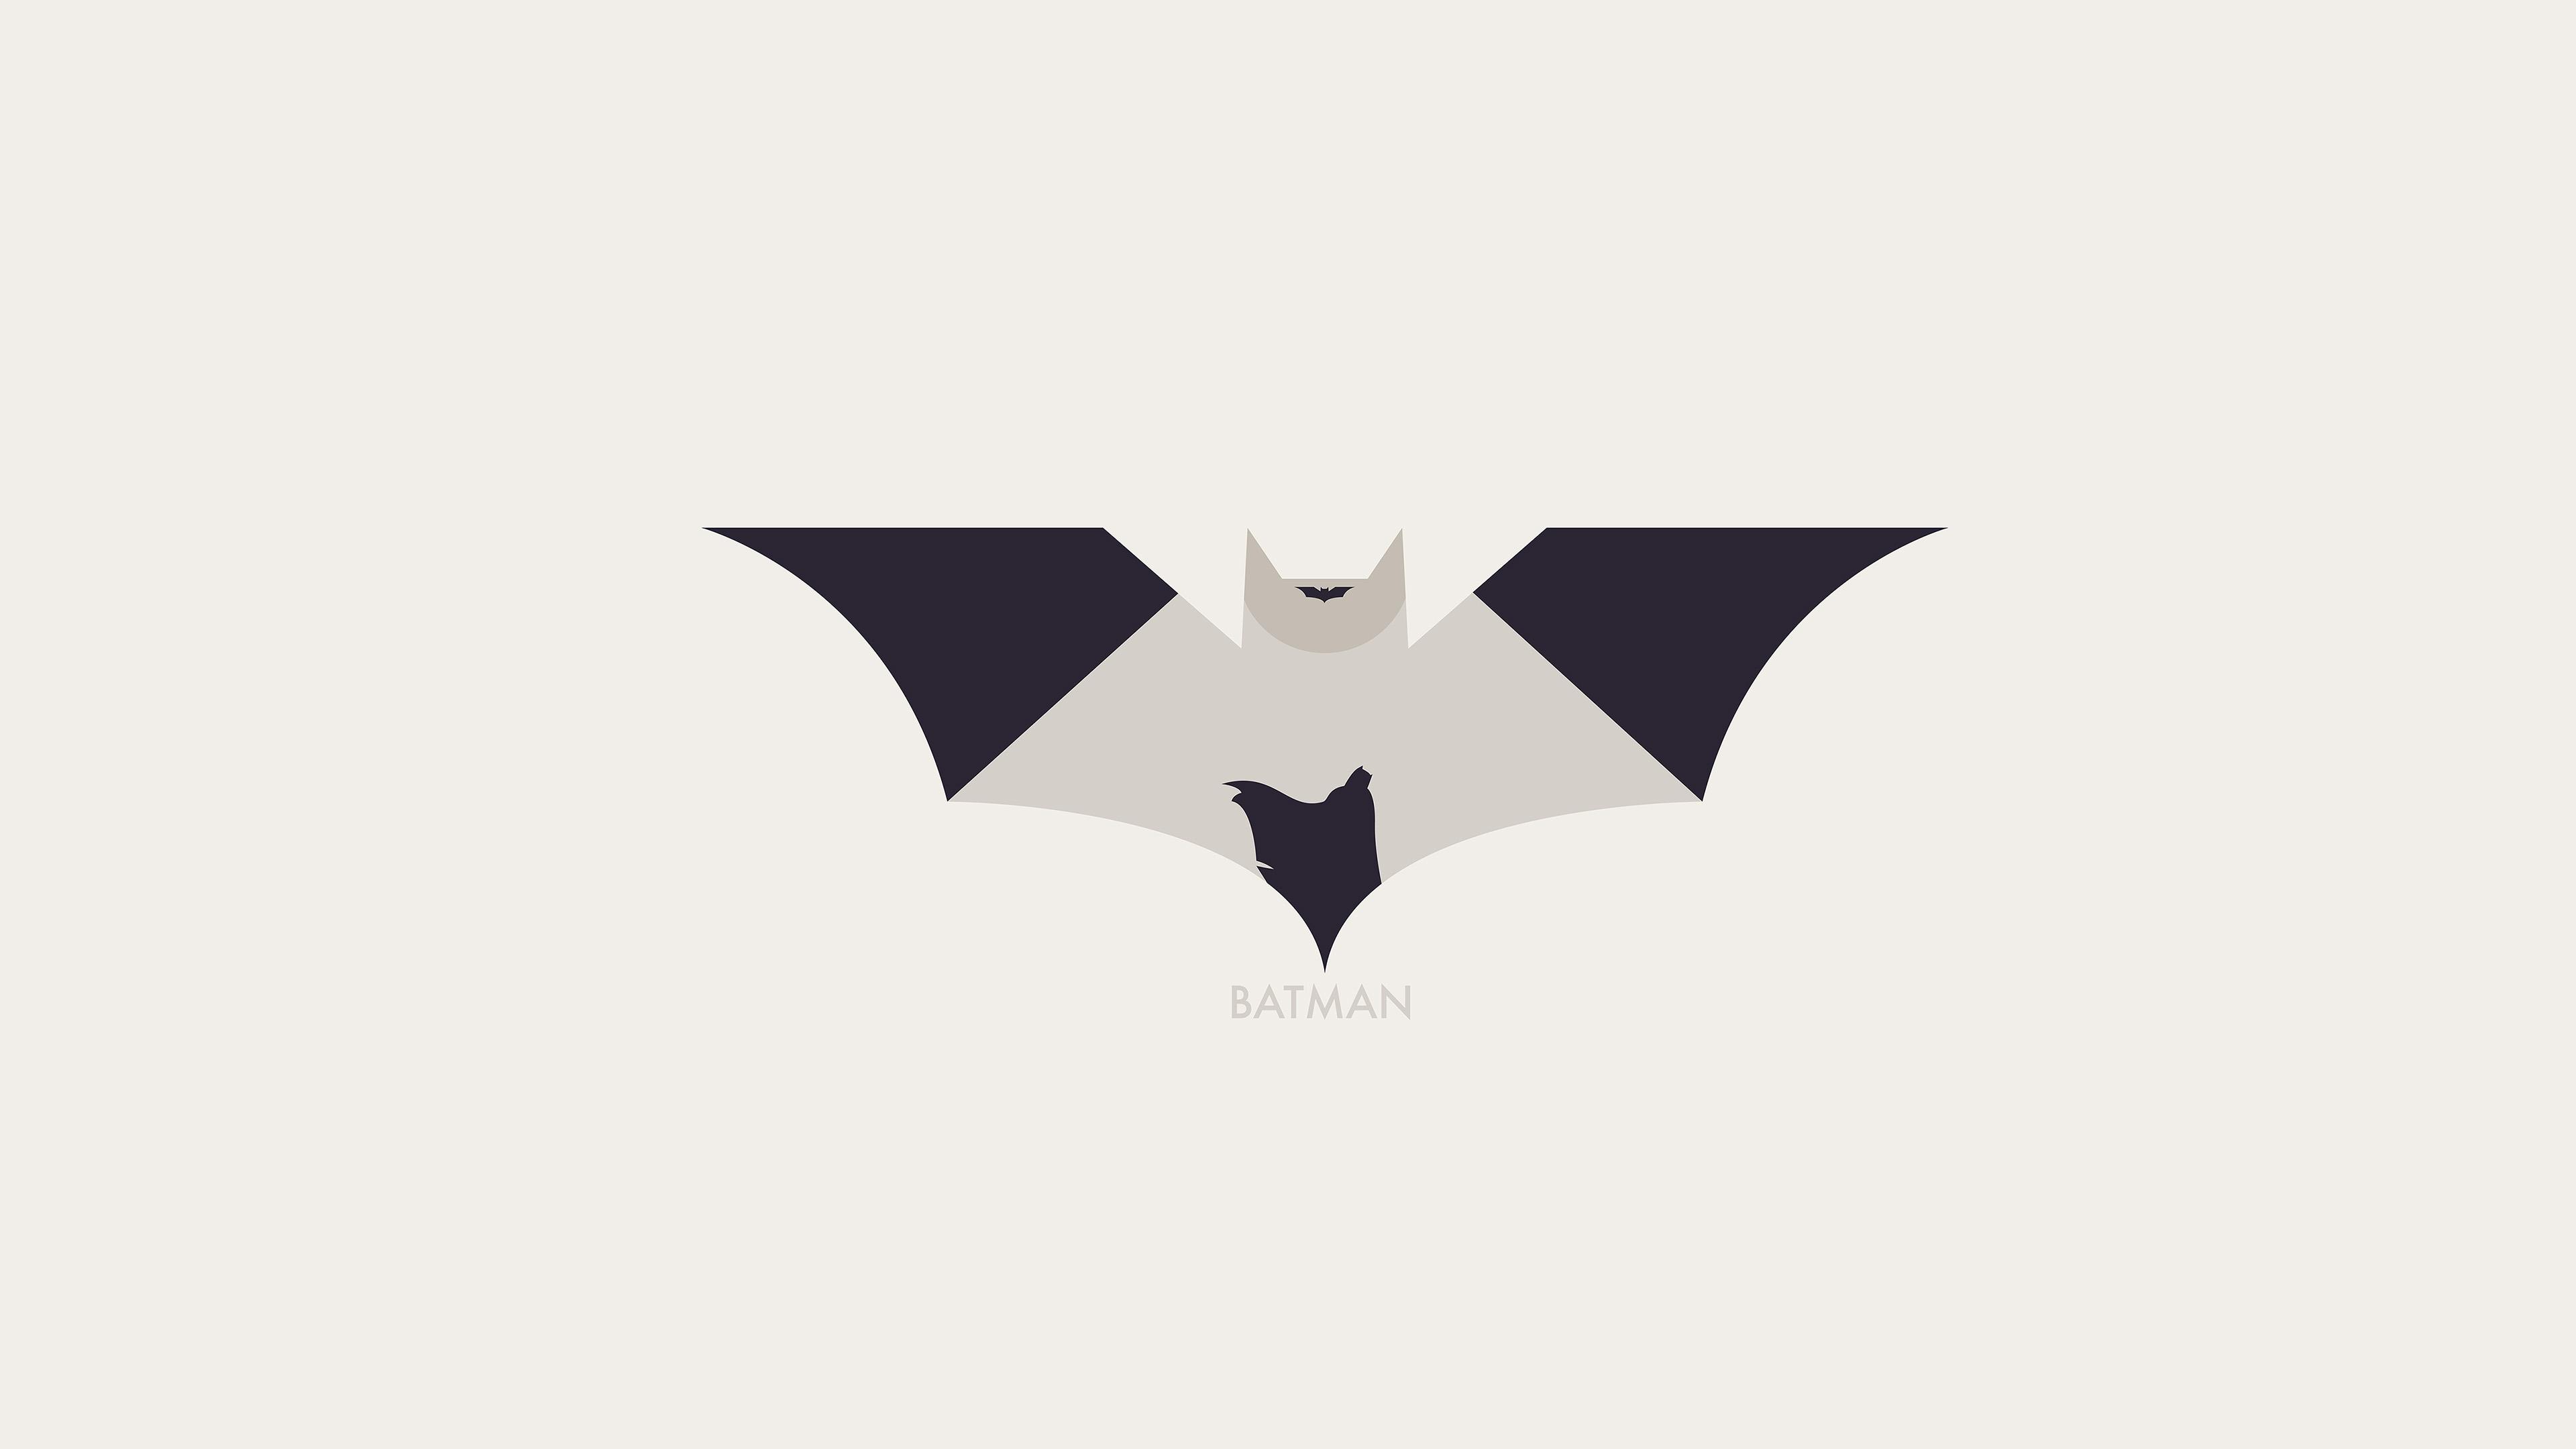 Ao27 hugoli art batman minimal logo illust for Minimal art logo